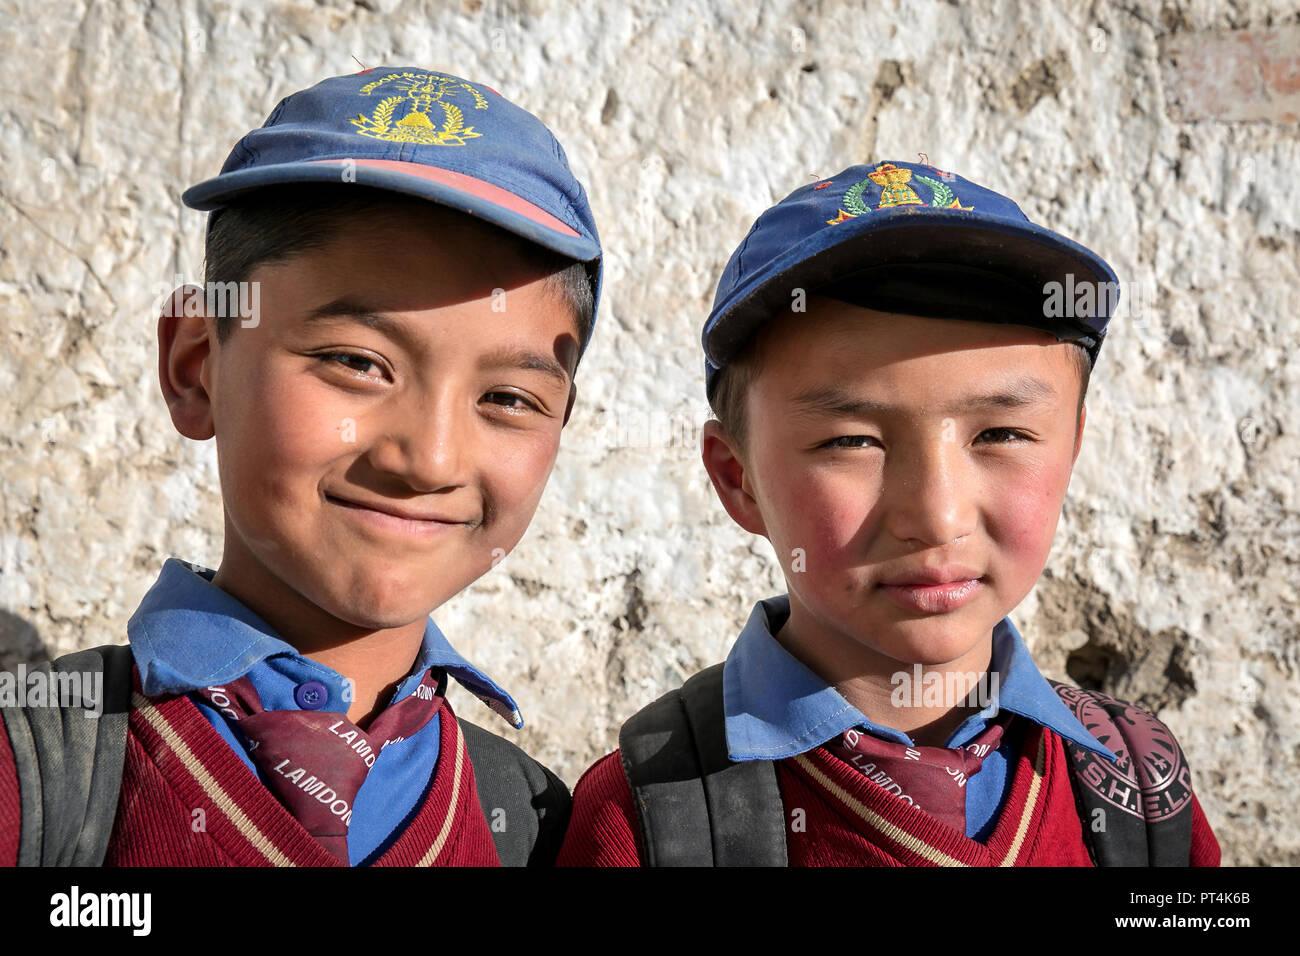 Two schoolboys in uniforms, Leh, Ladakh, Kashmir, India - Stock Image